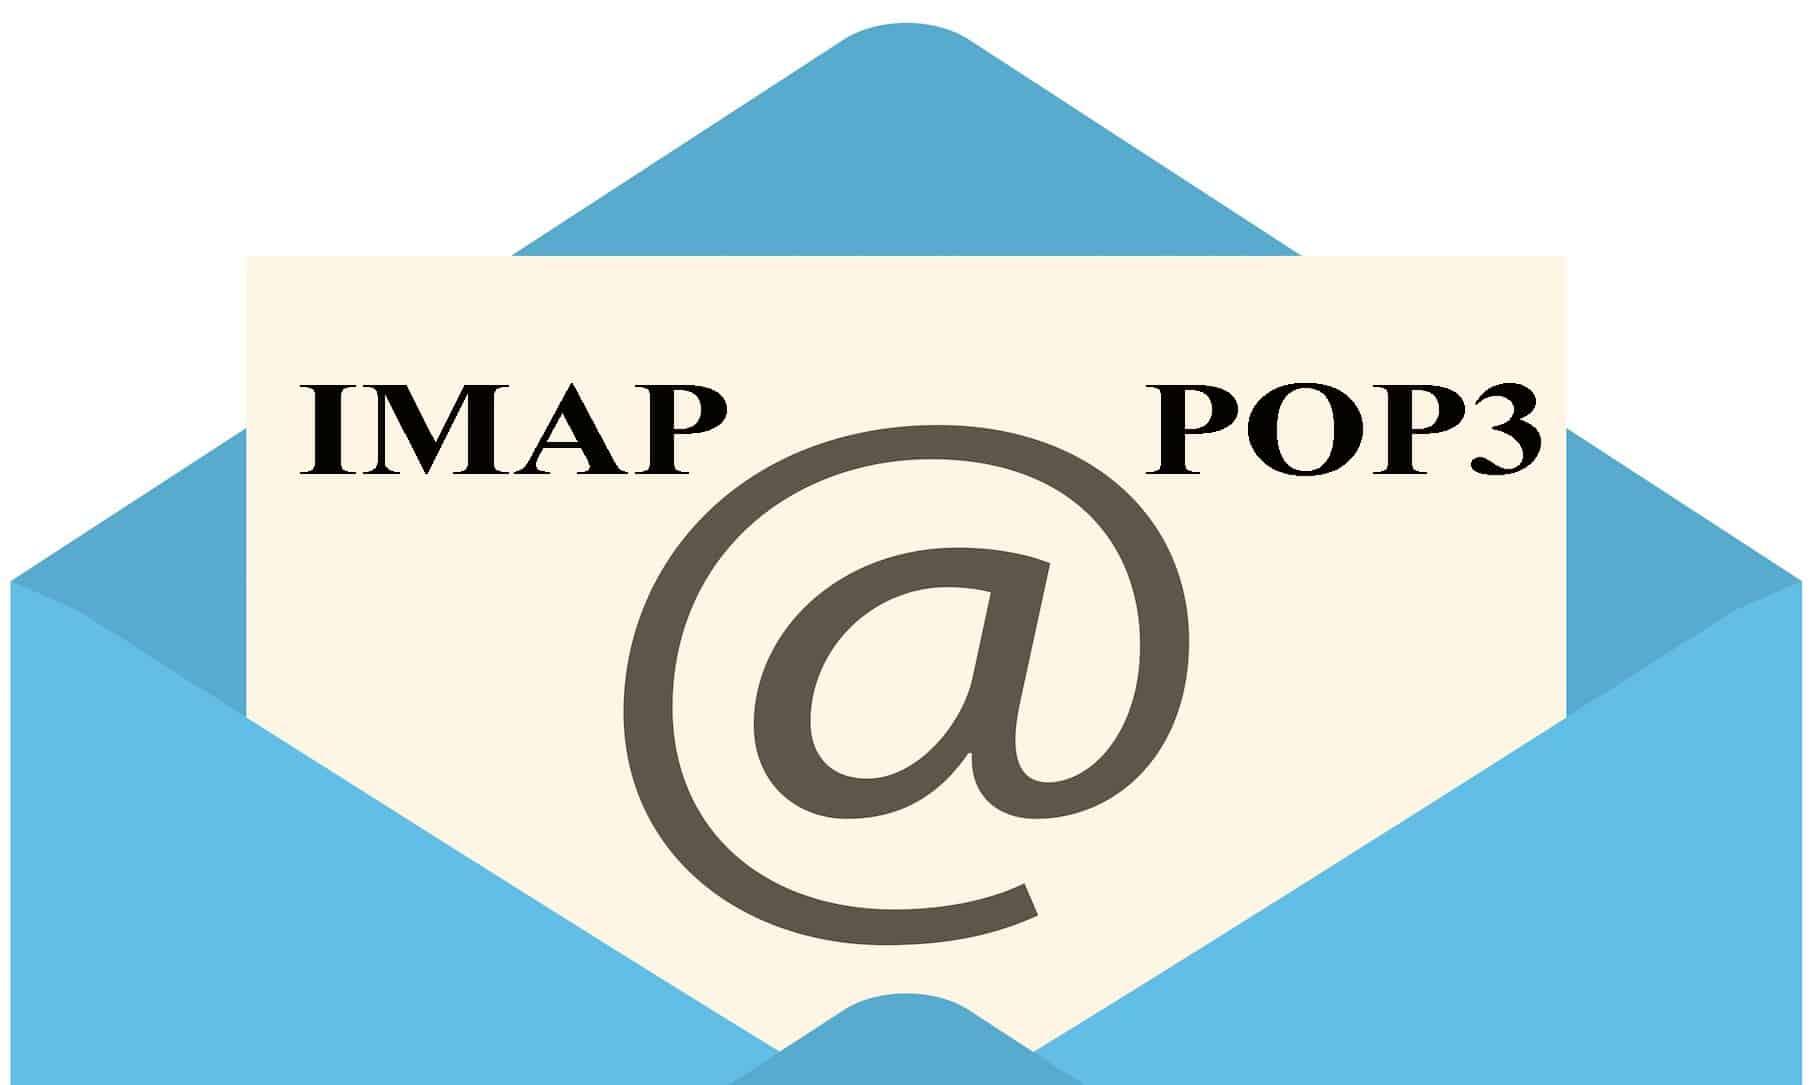 imap pop